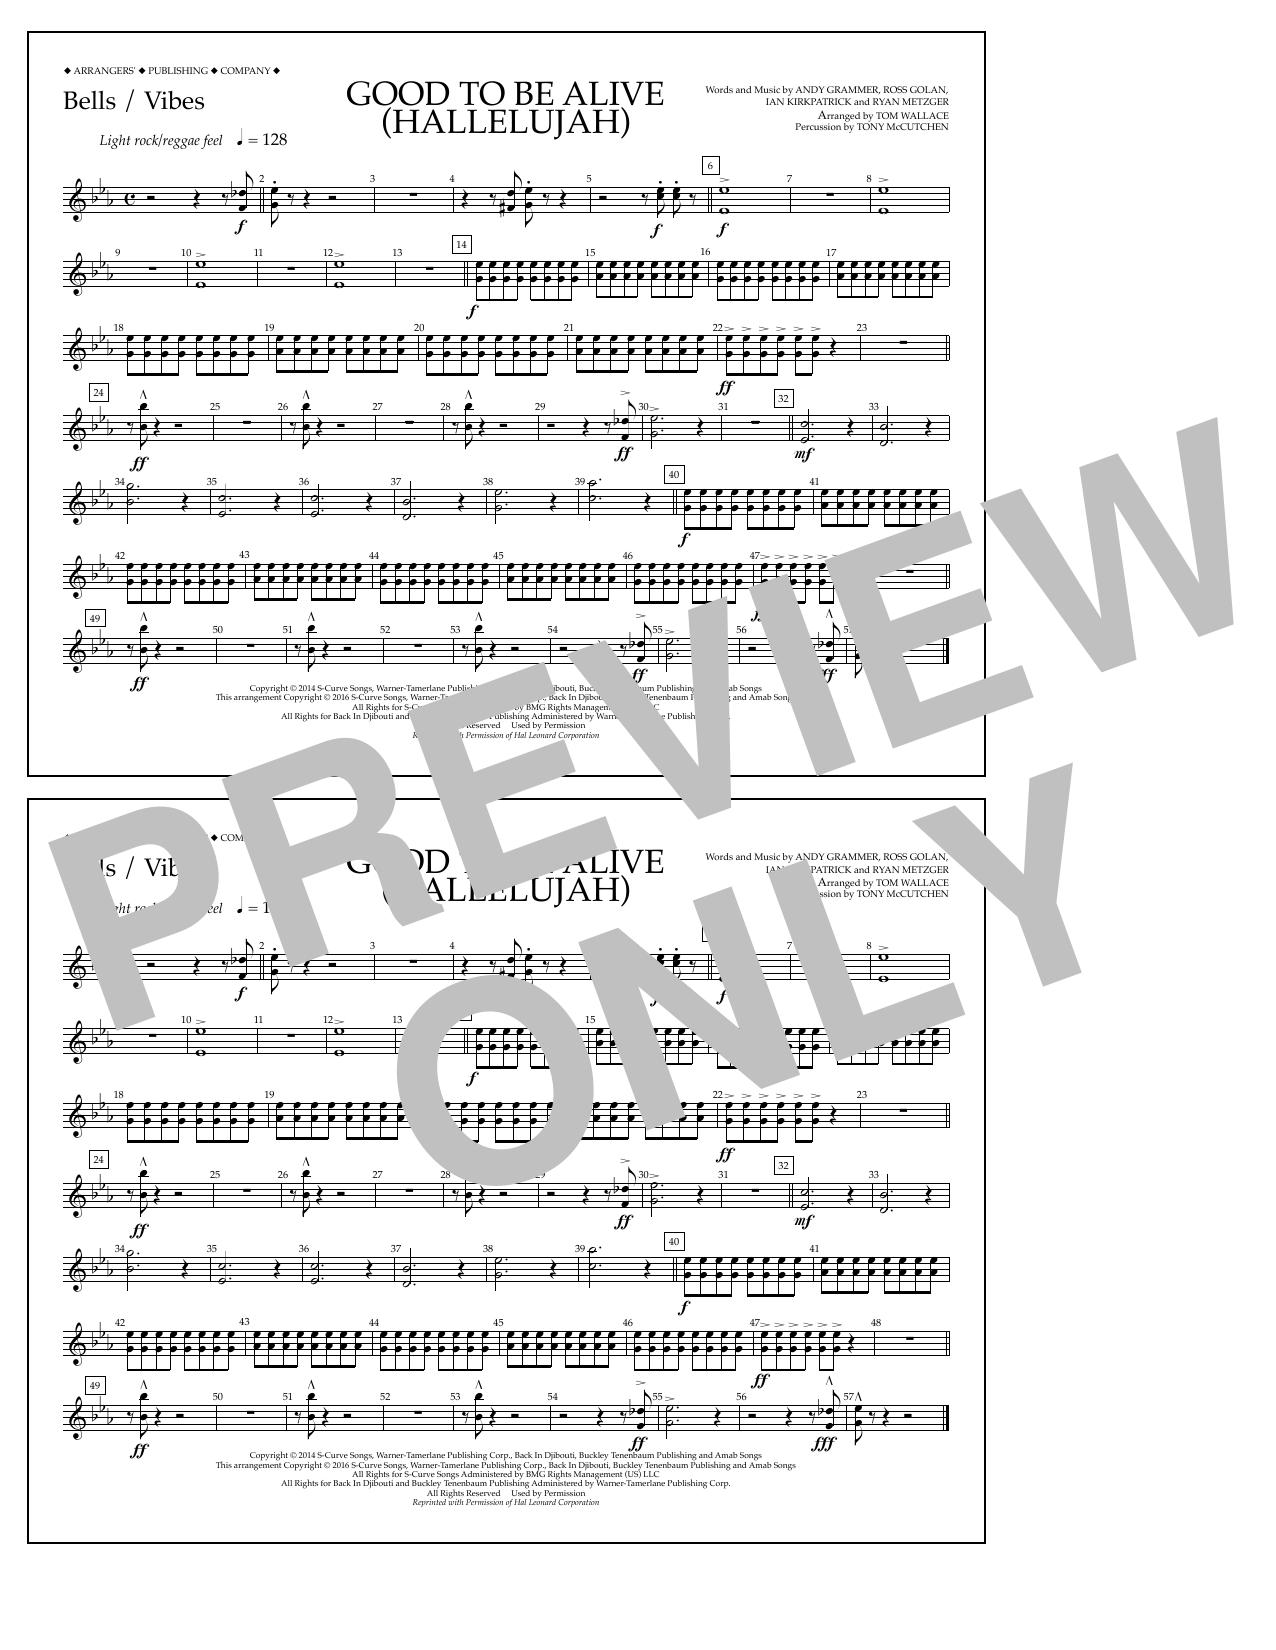 Andy Grammer - Good to Be Alive (Hallelujah) - Bells/Vibes